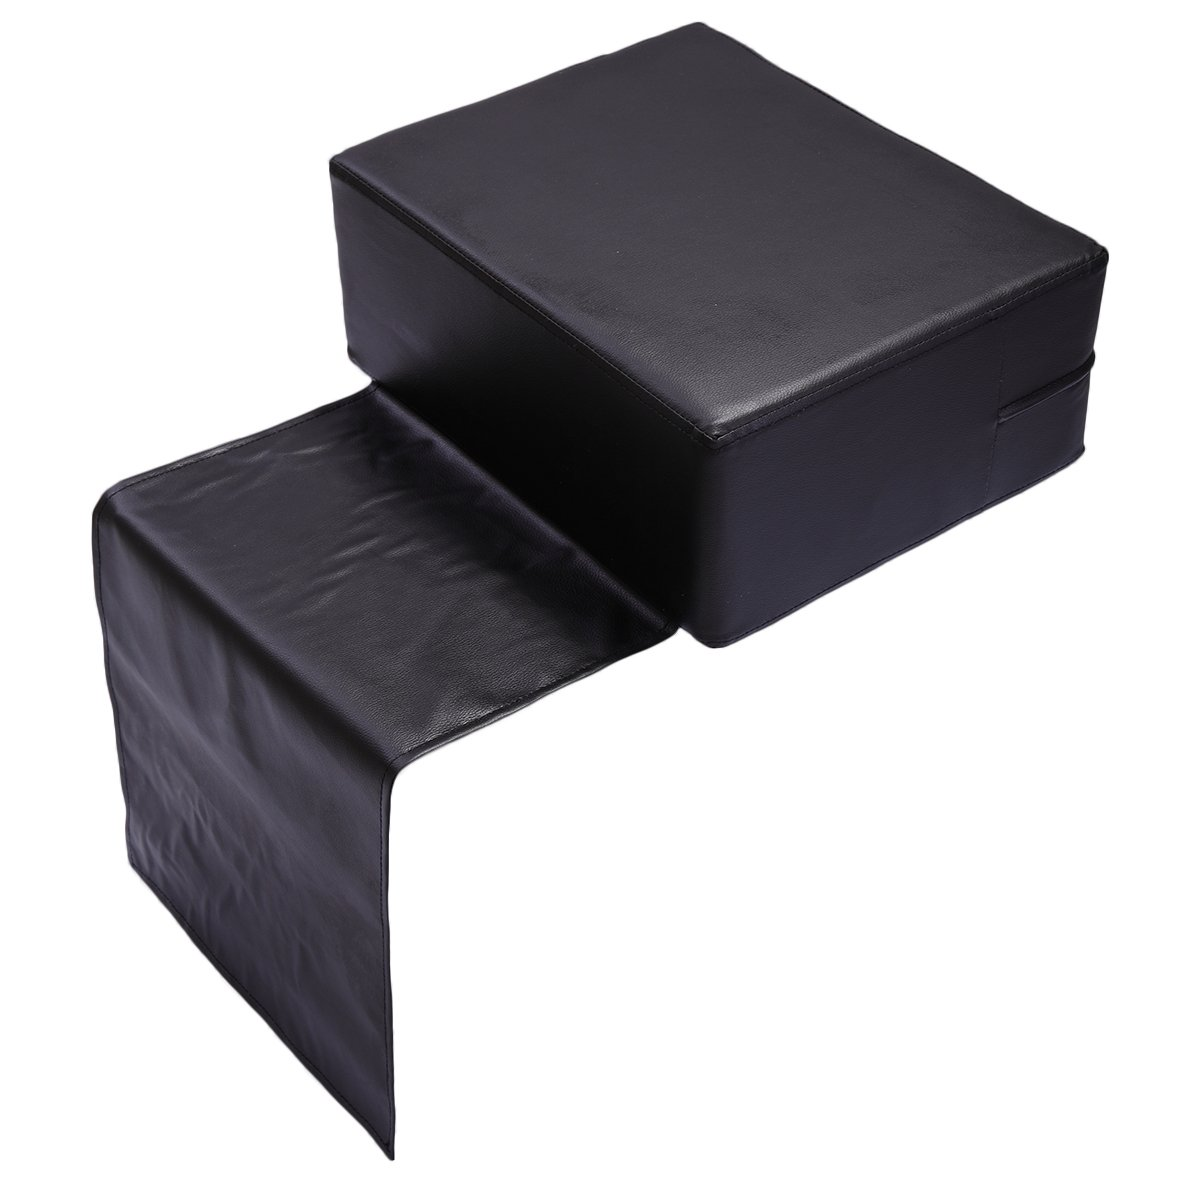 Tobbi Black Barber Beauty Salon Spa Equipment Styling Chair Child Booster Seat Cushion